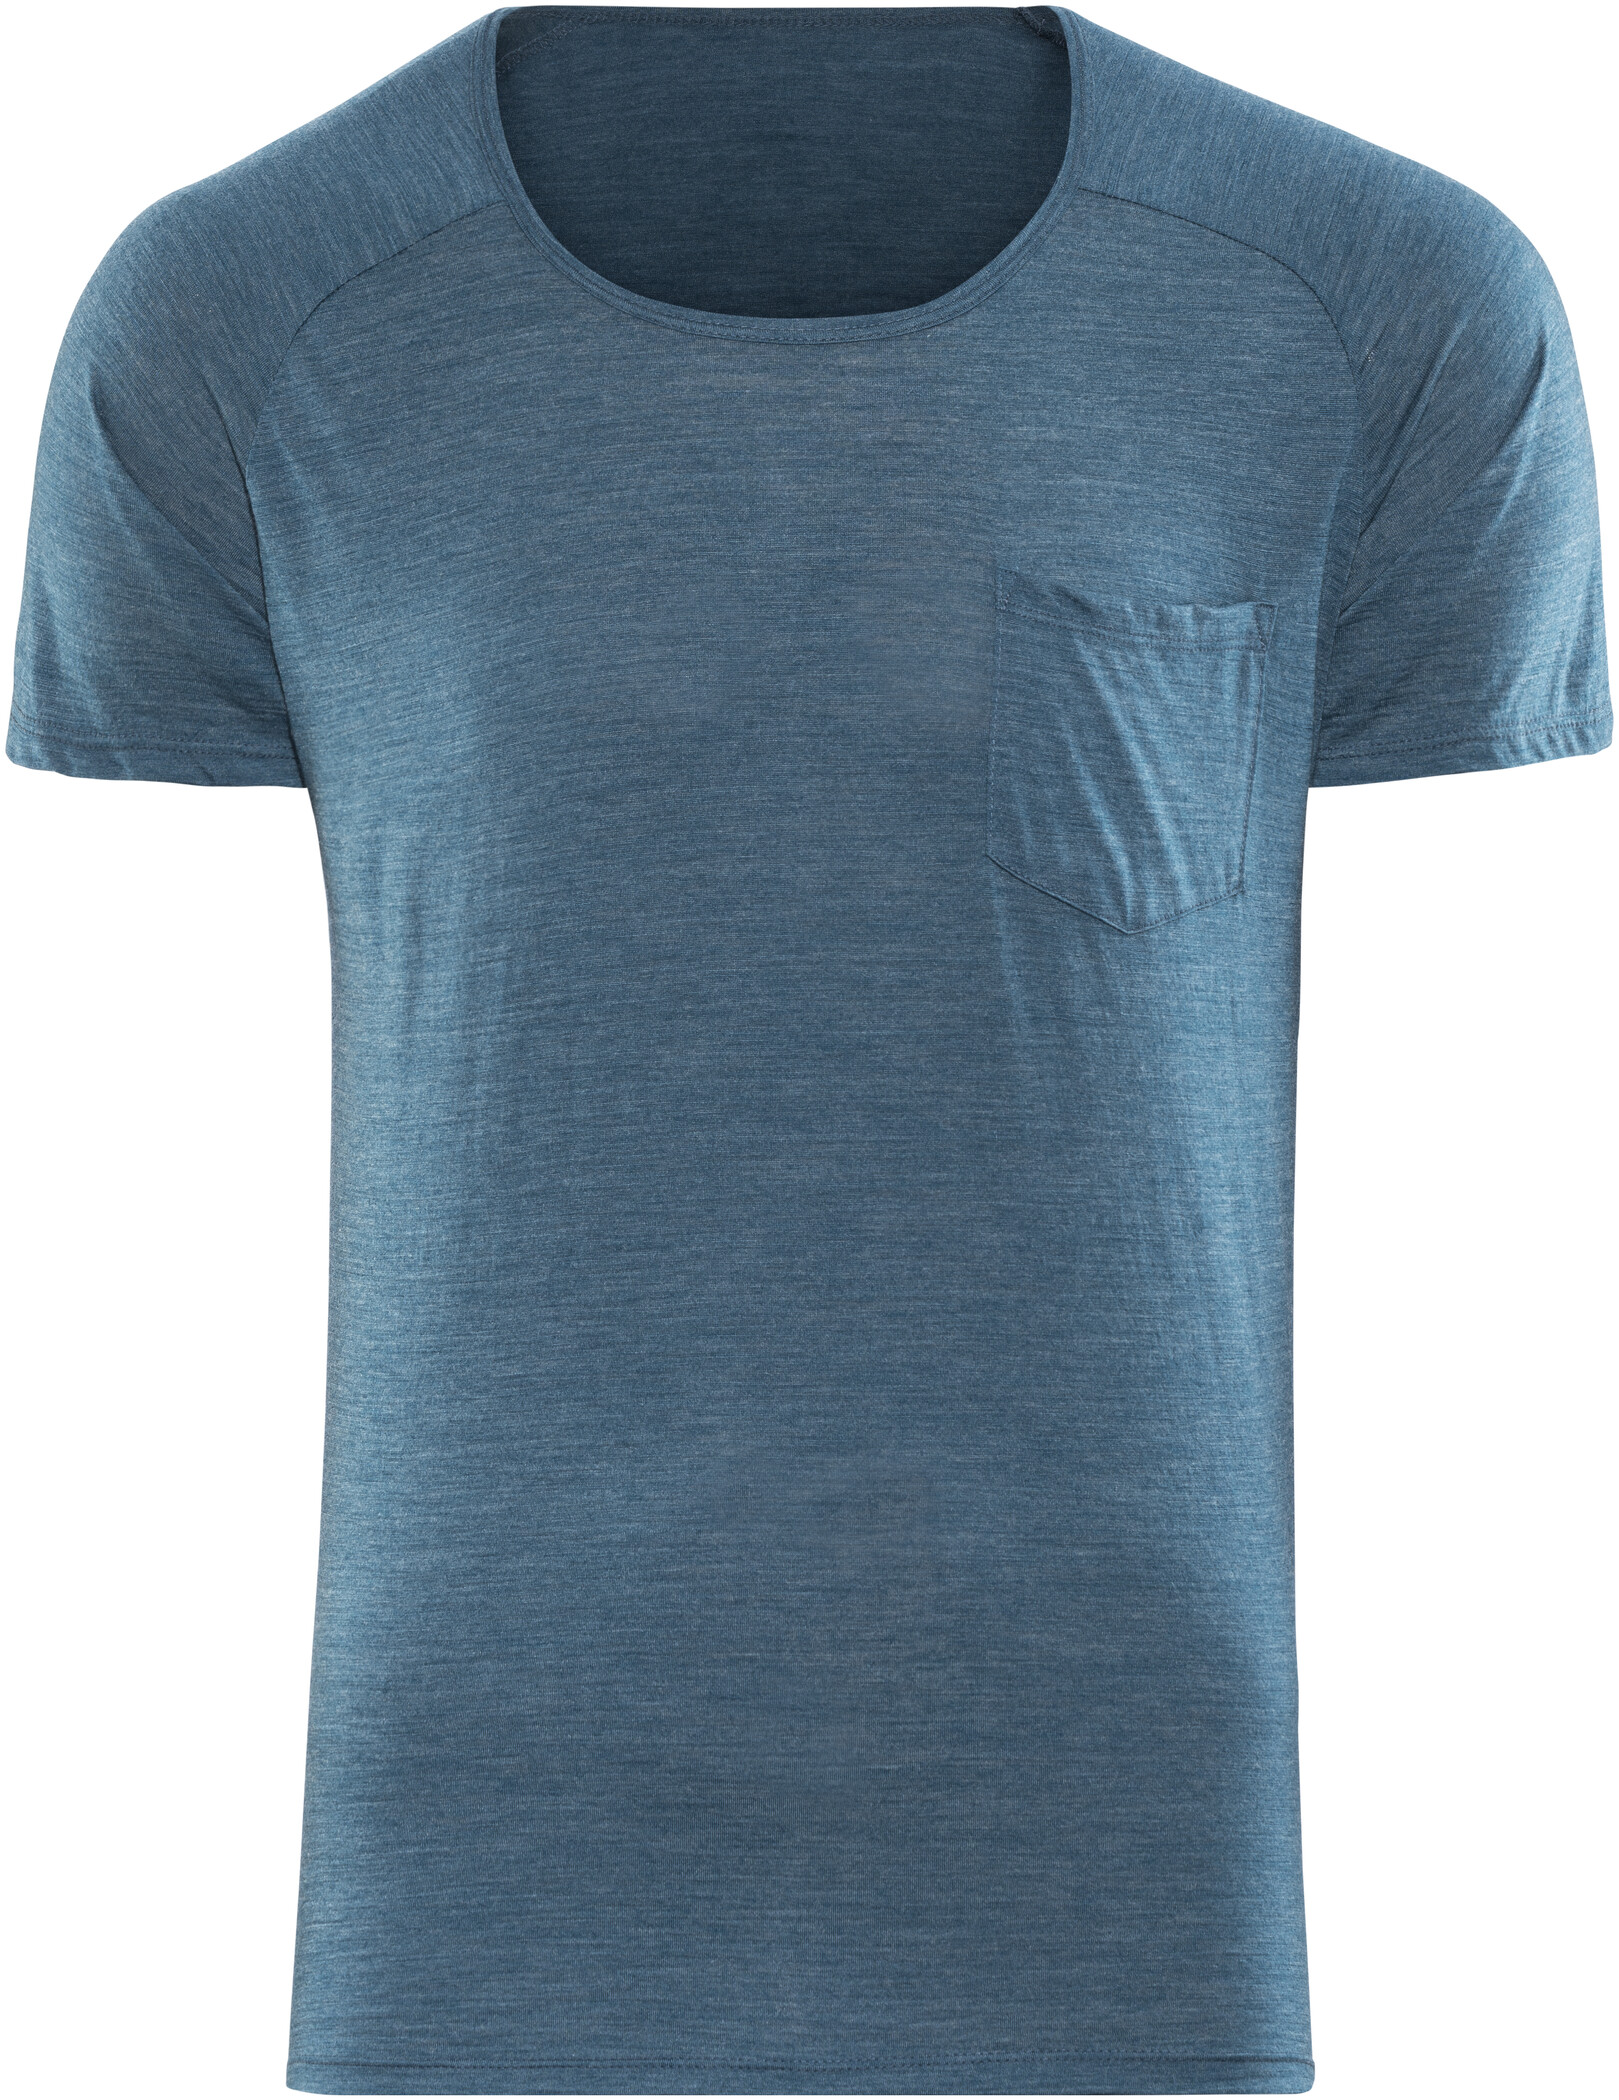 Renegade Mens Printed T-Shirt Black Grey Green White Blue Tee Shirts All Sizes